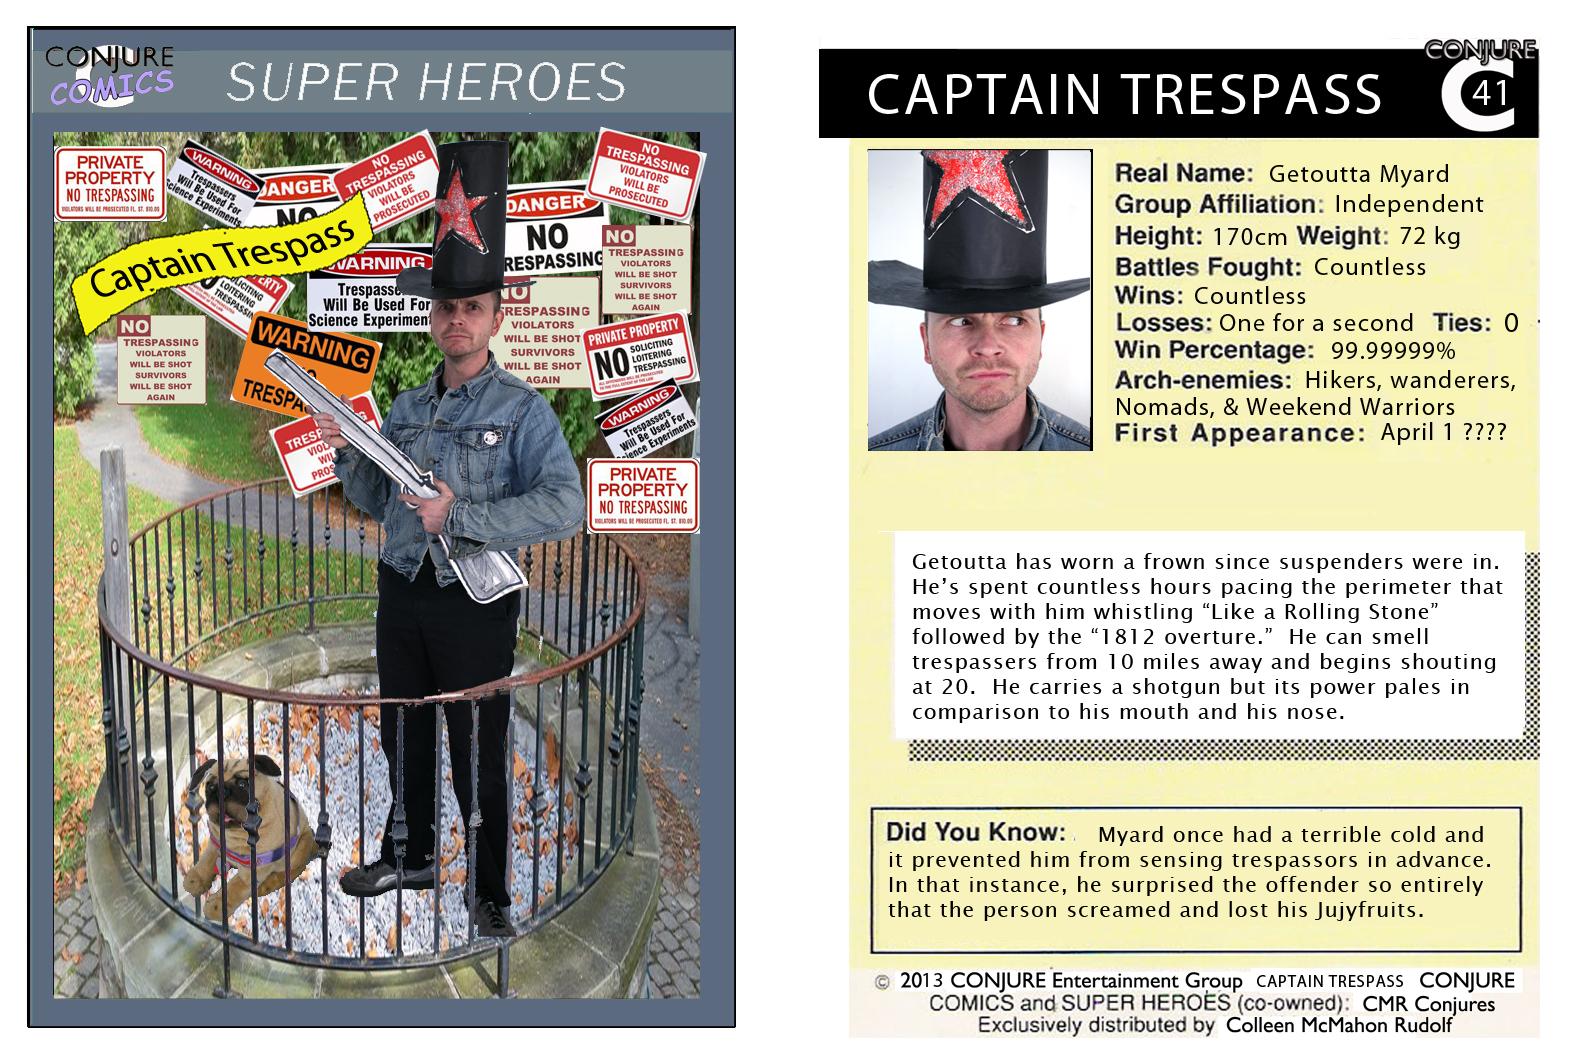 Captain Trespass